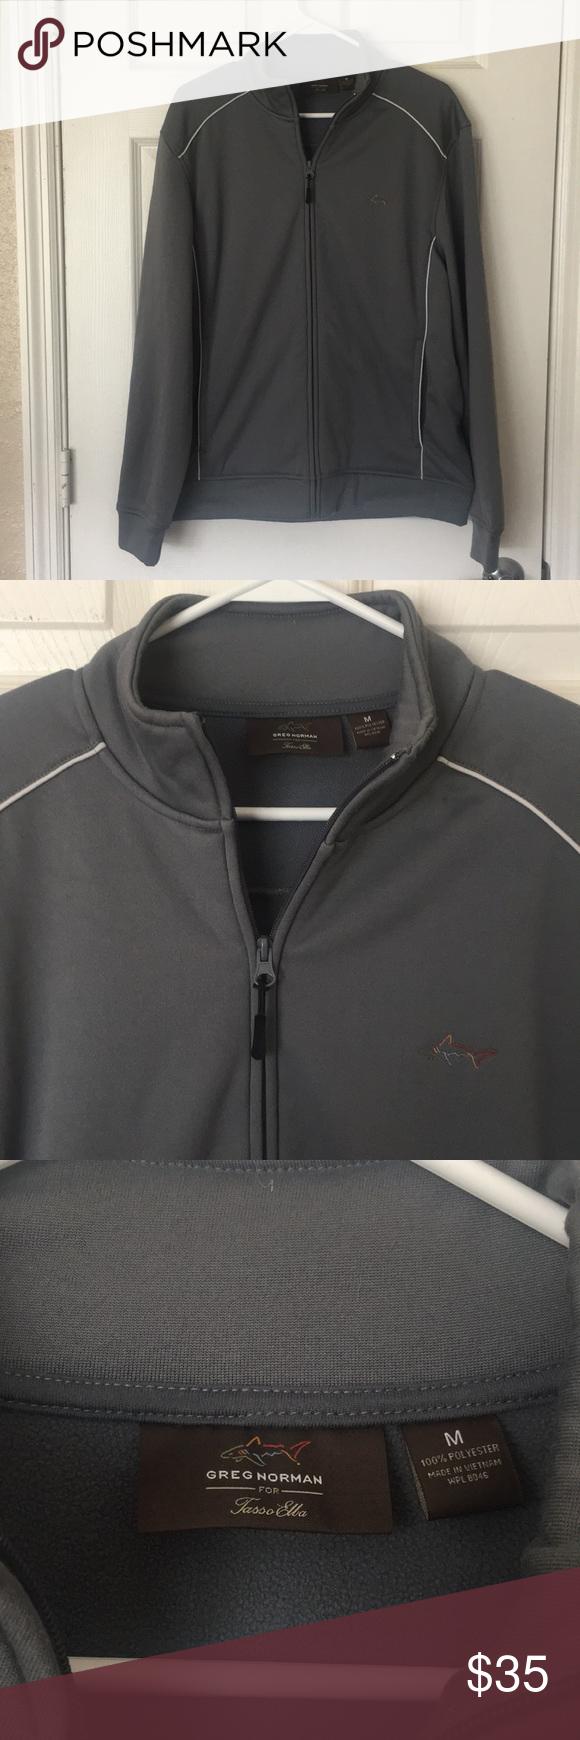 Greg Norman Track Suit Jacket Tracksuit Jackets Suit Jacket